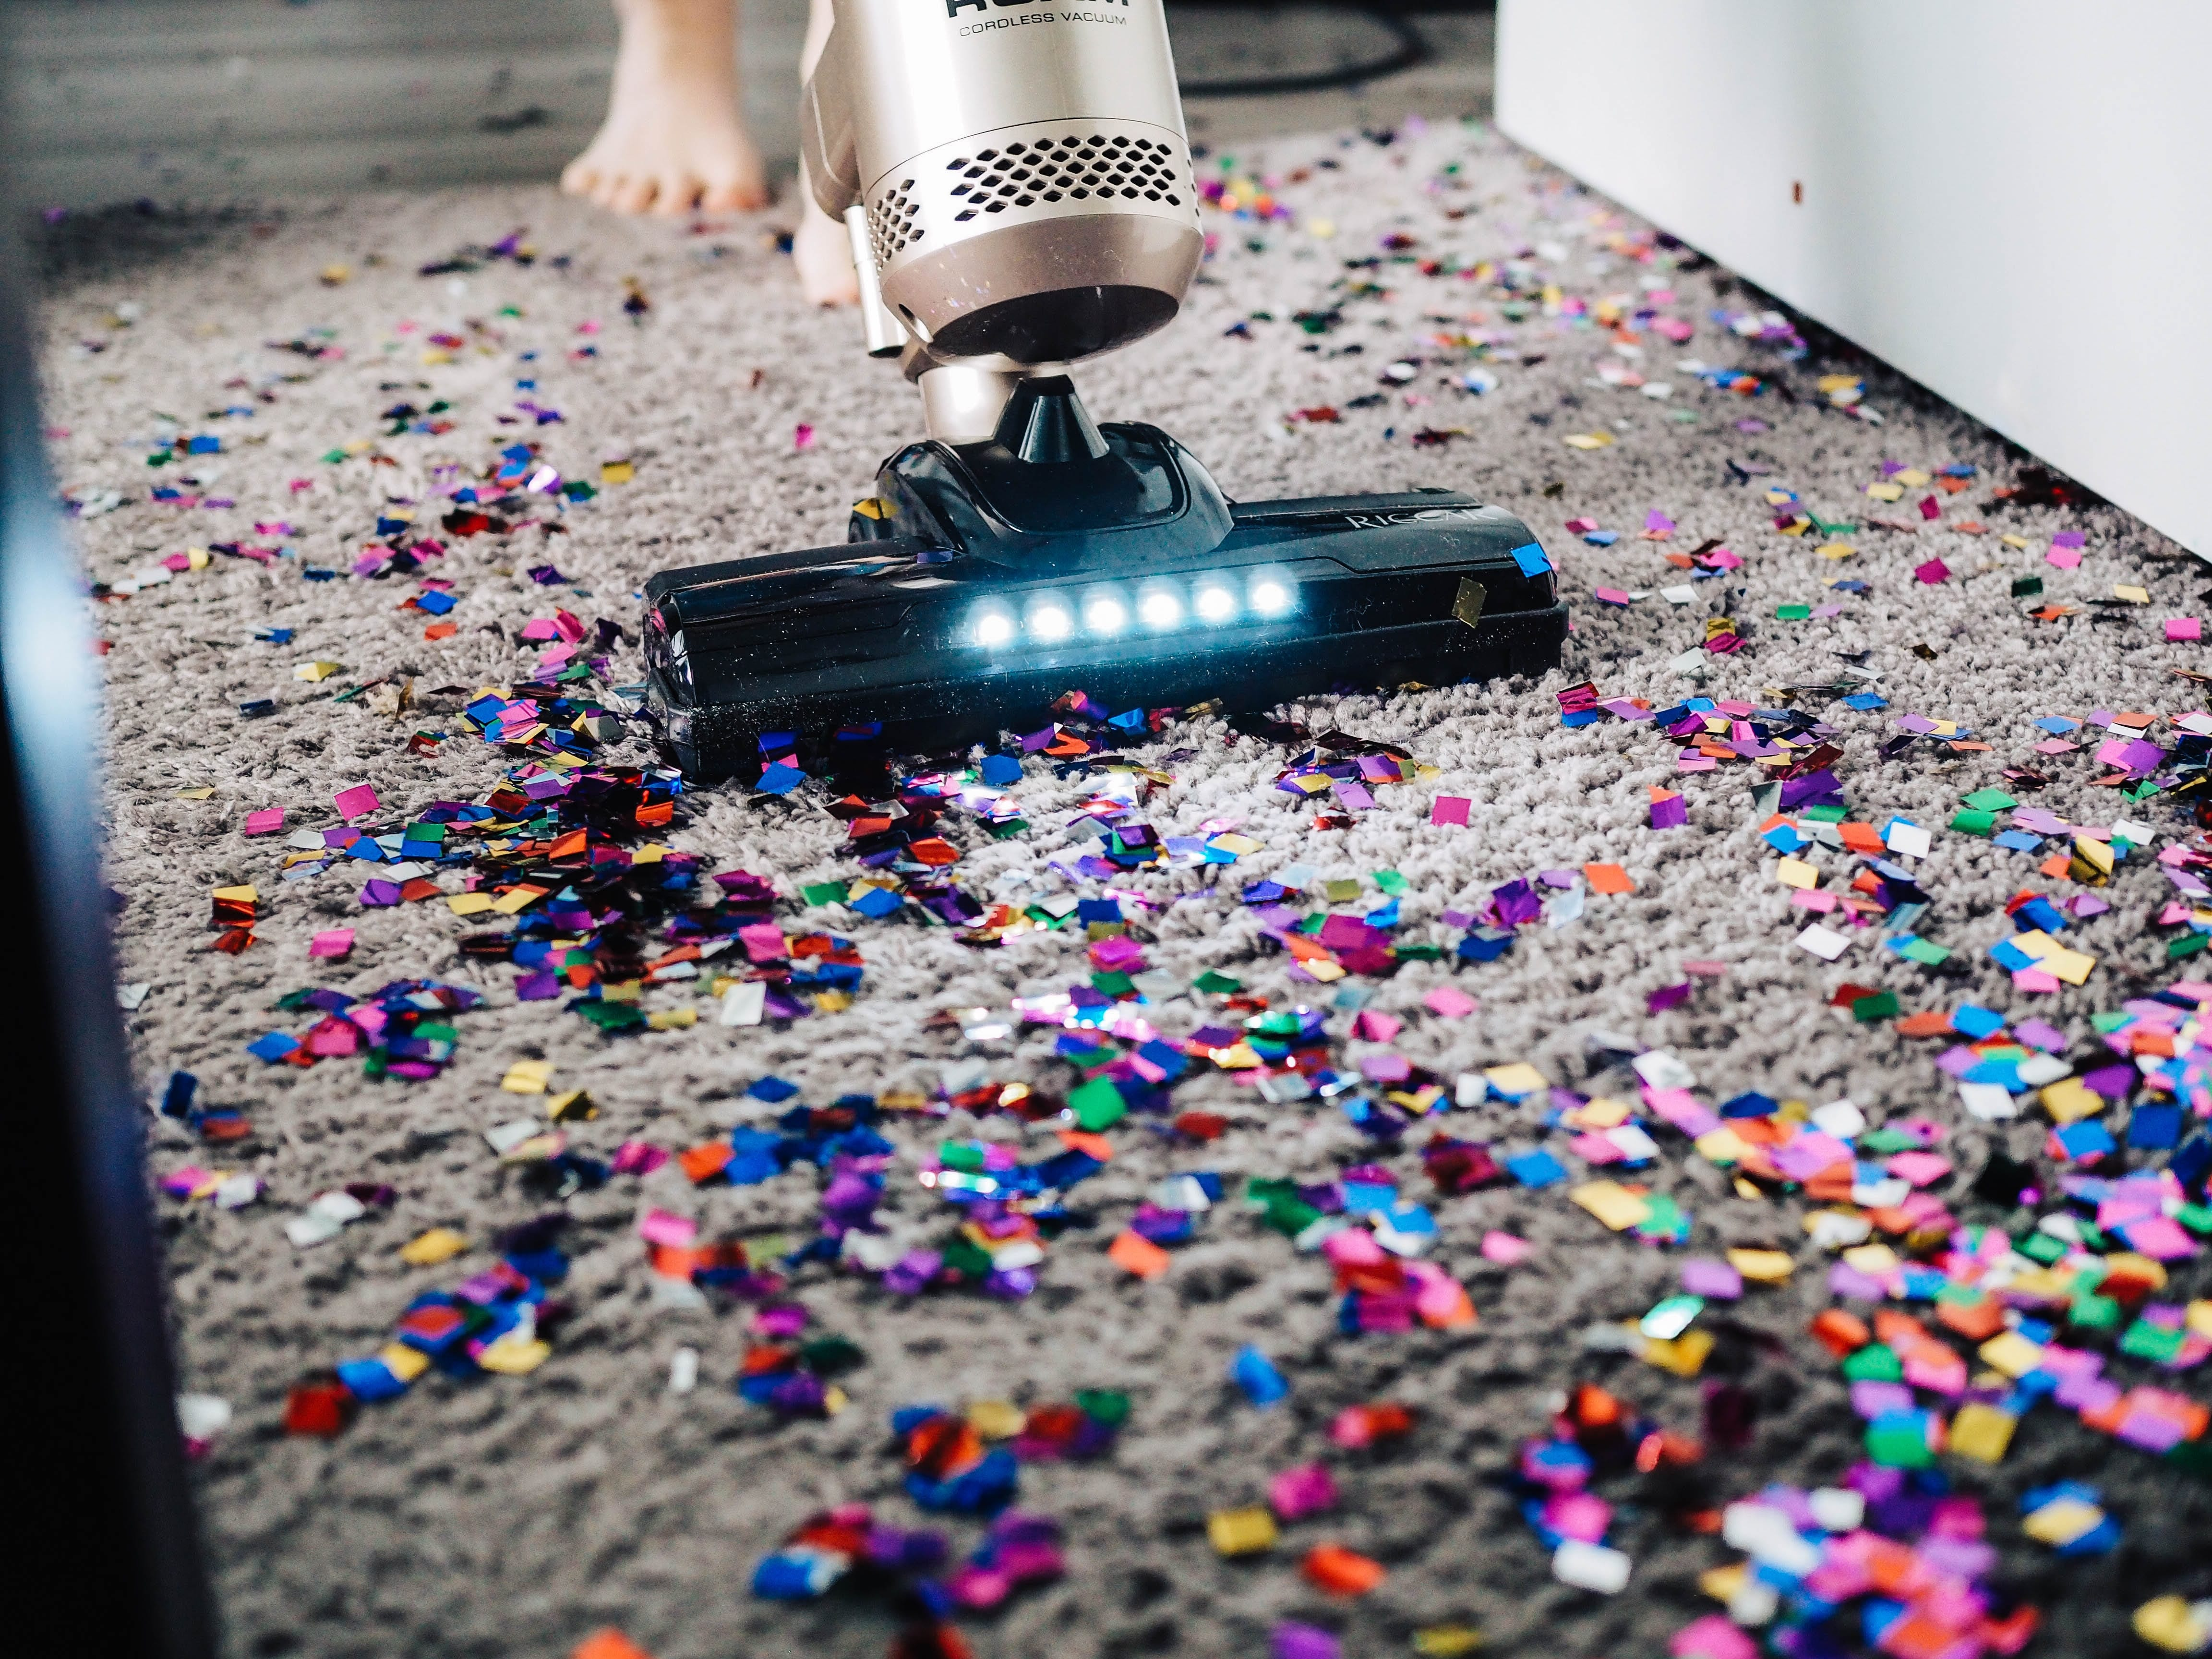 Vacuum on messy carpet